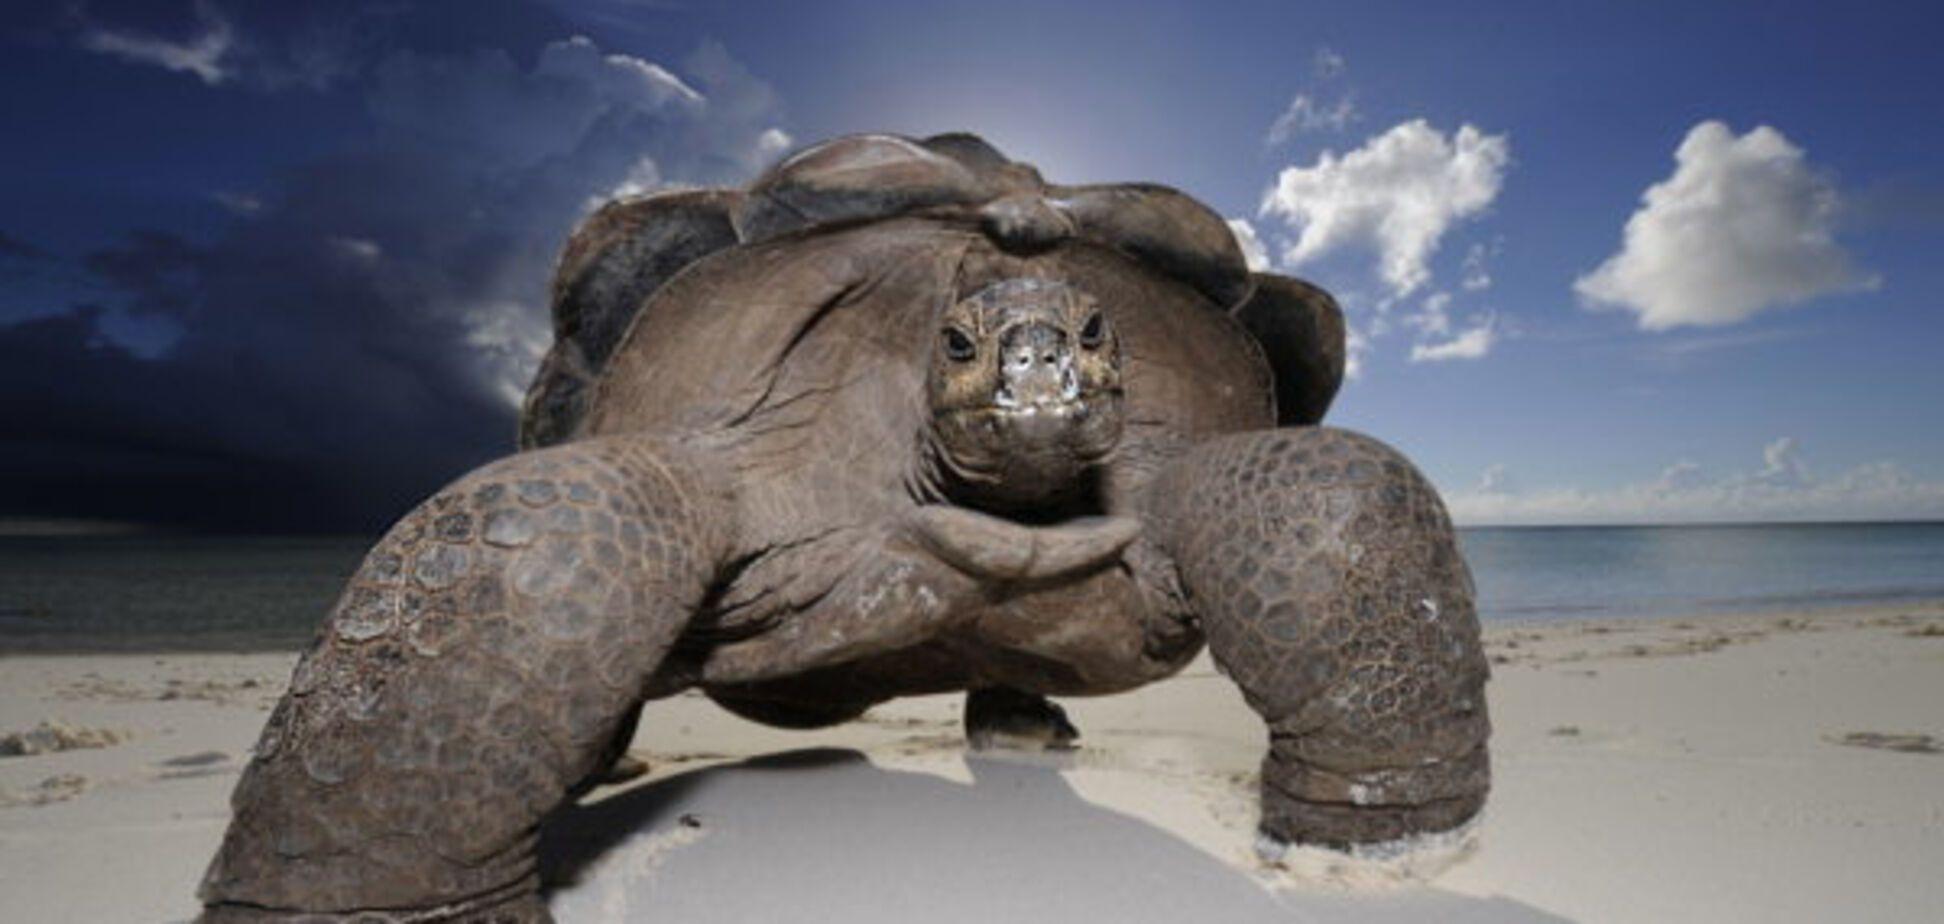 огромная черепаха